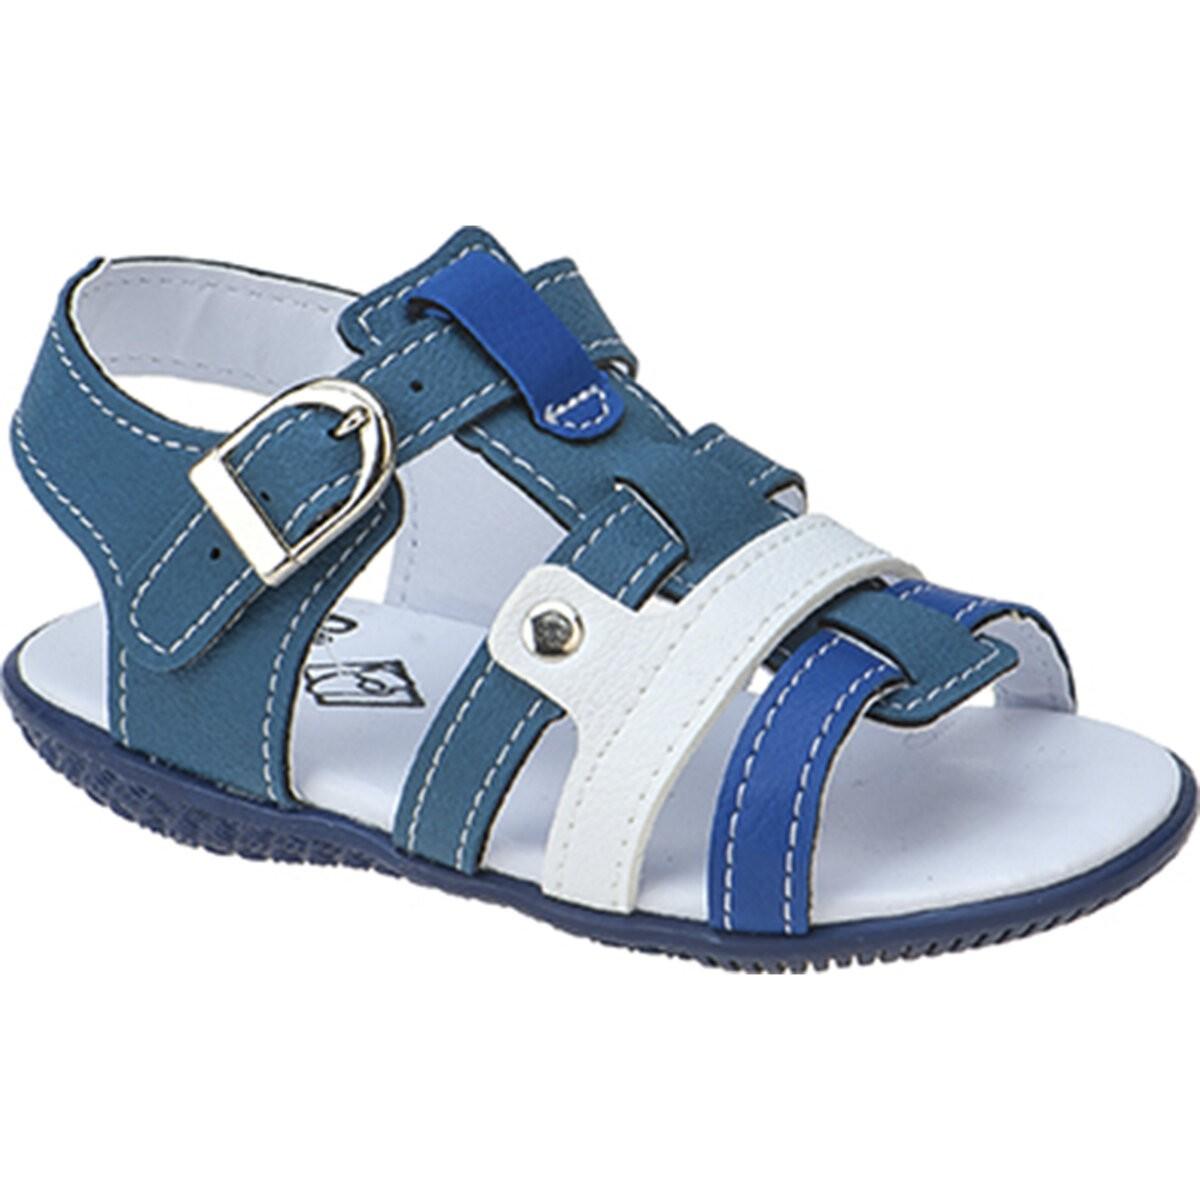 Sandália Infantil Menino Baby Tricolor Tiras Azul